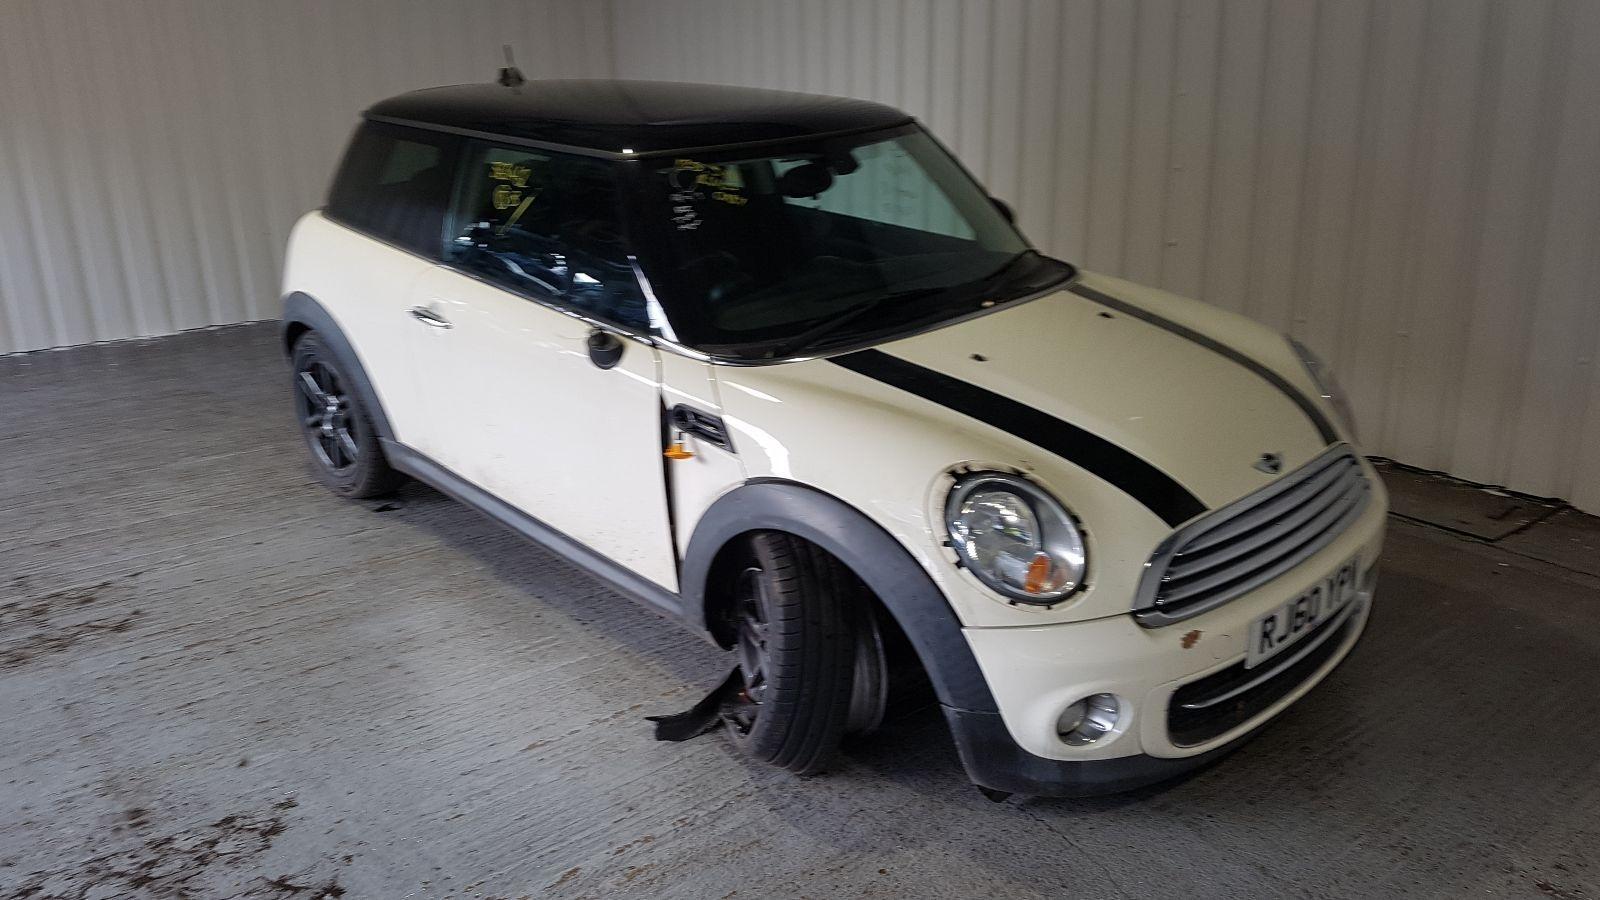 Image for a Mini (bmw) Mini 2011 3 Door Hatchback